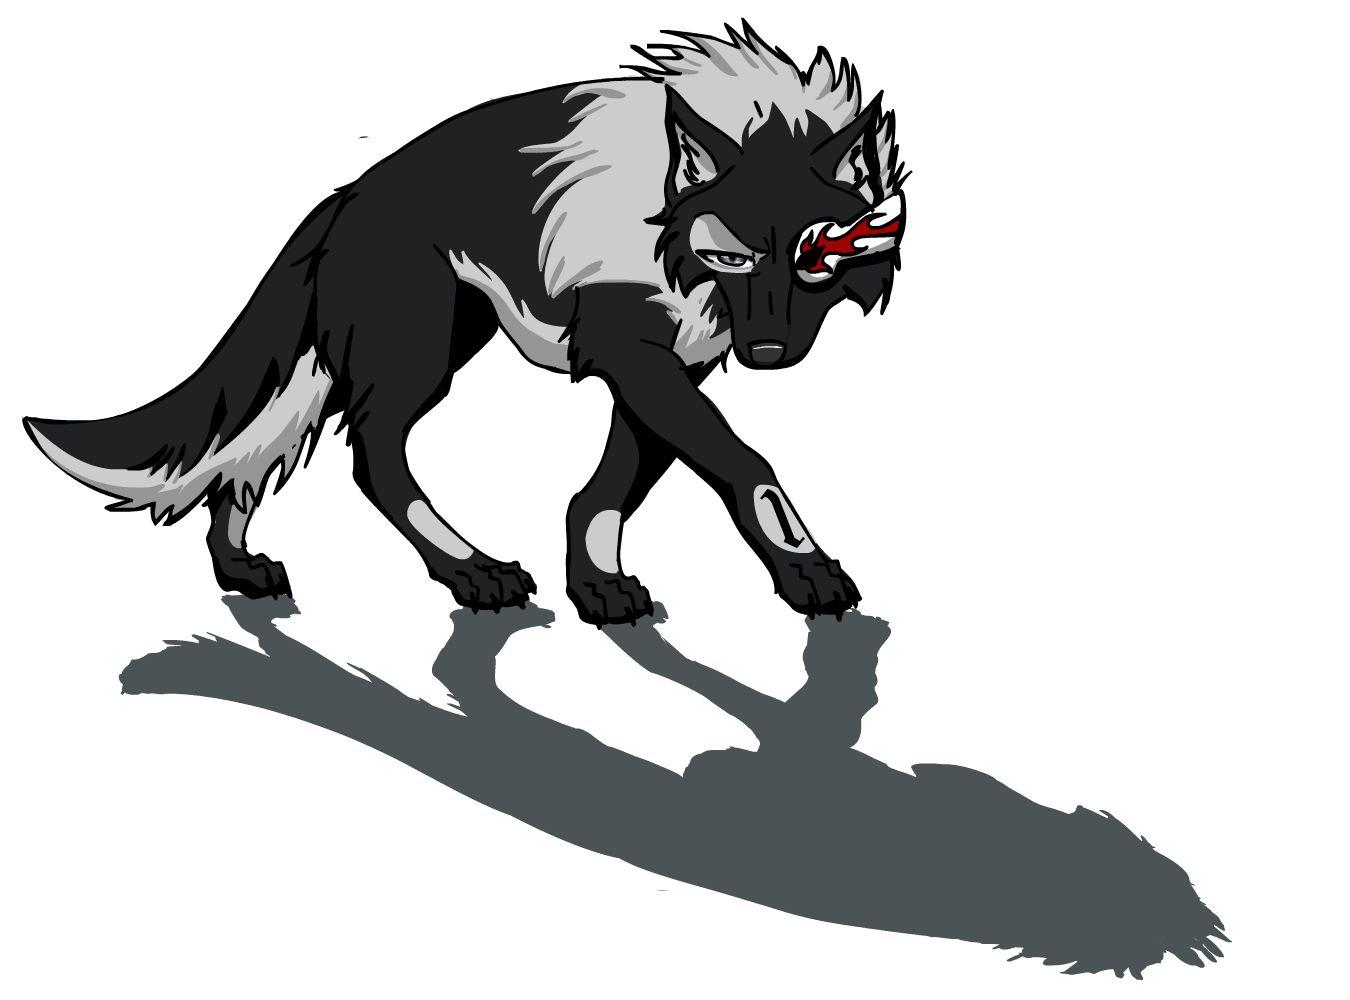 Stark wolf by Vick-wolf